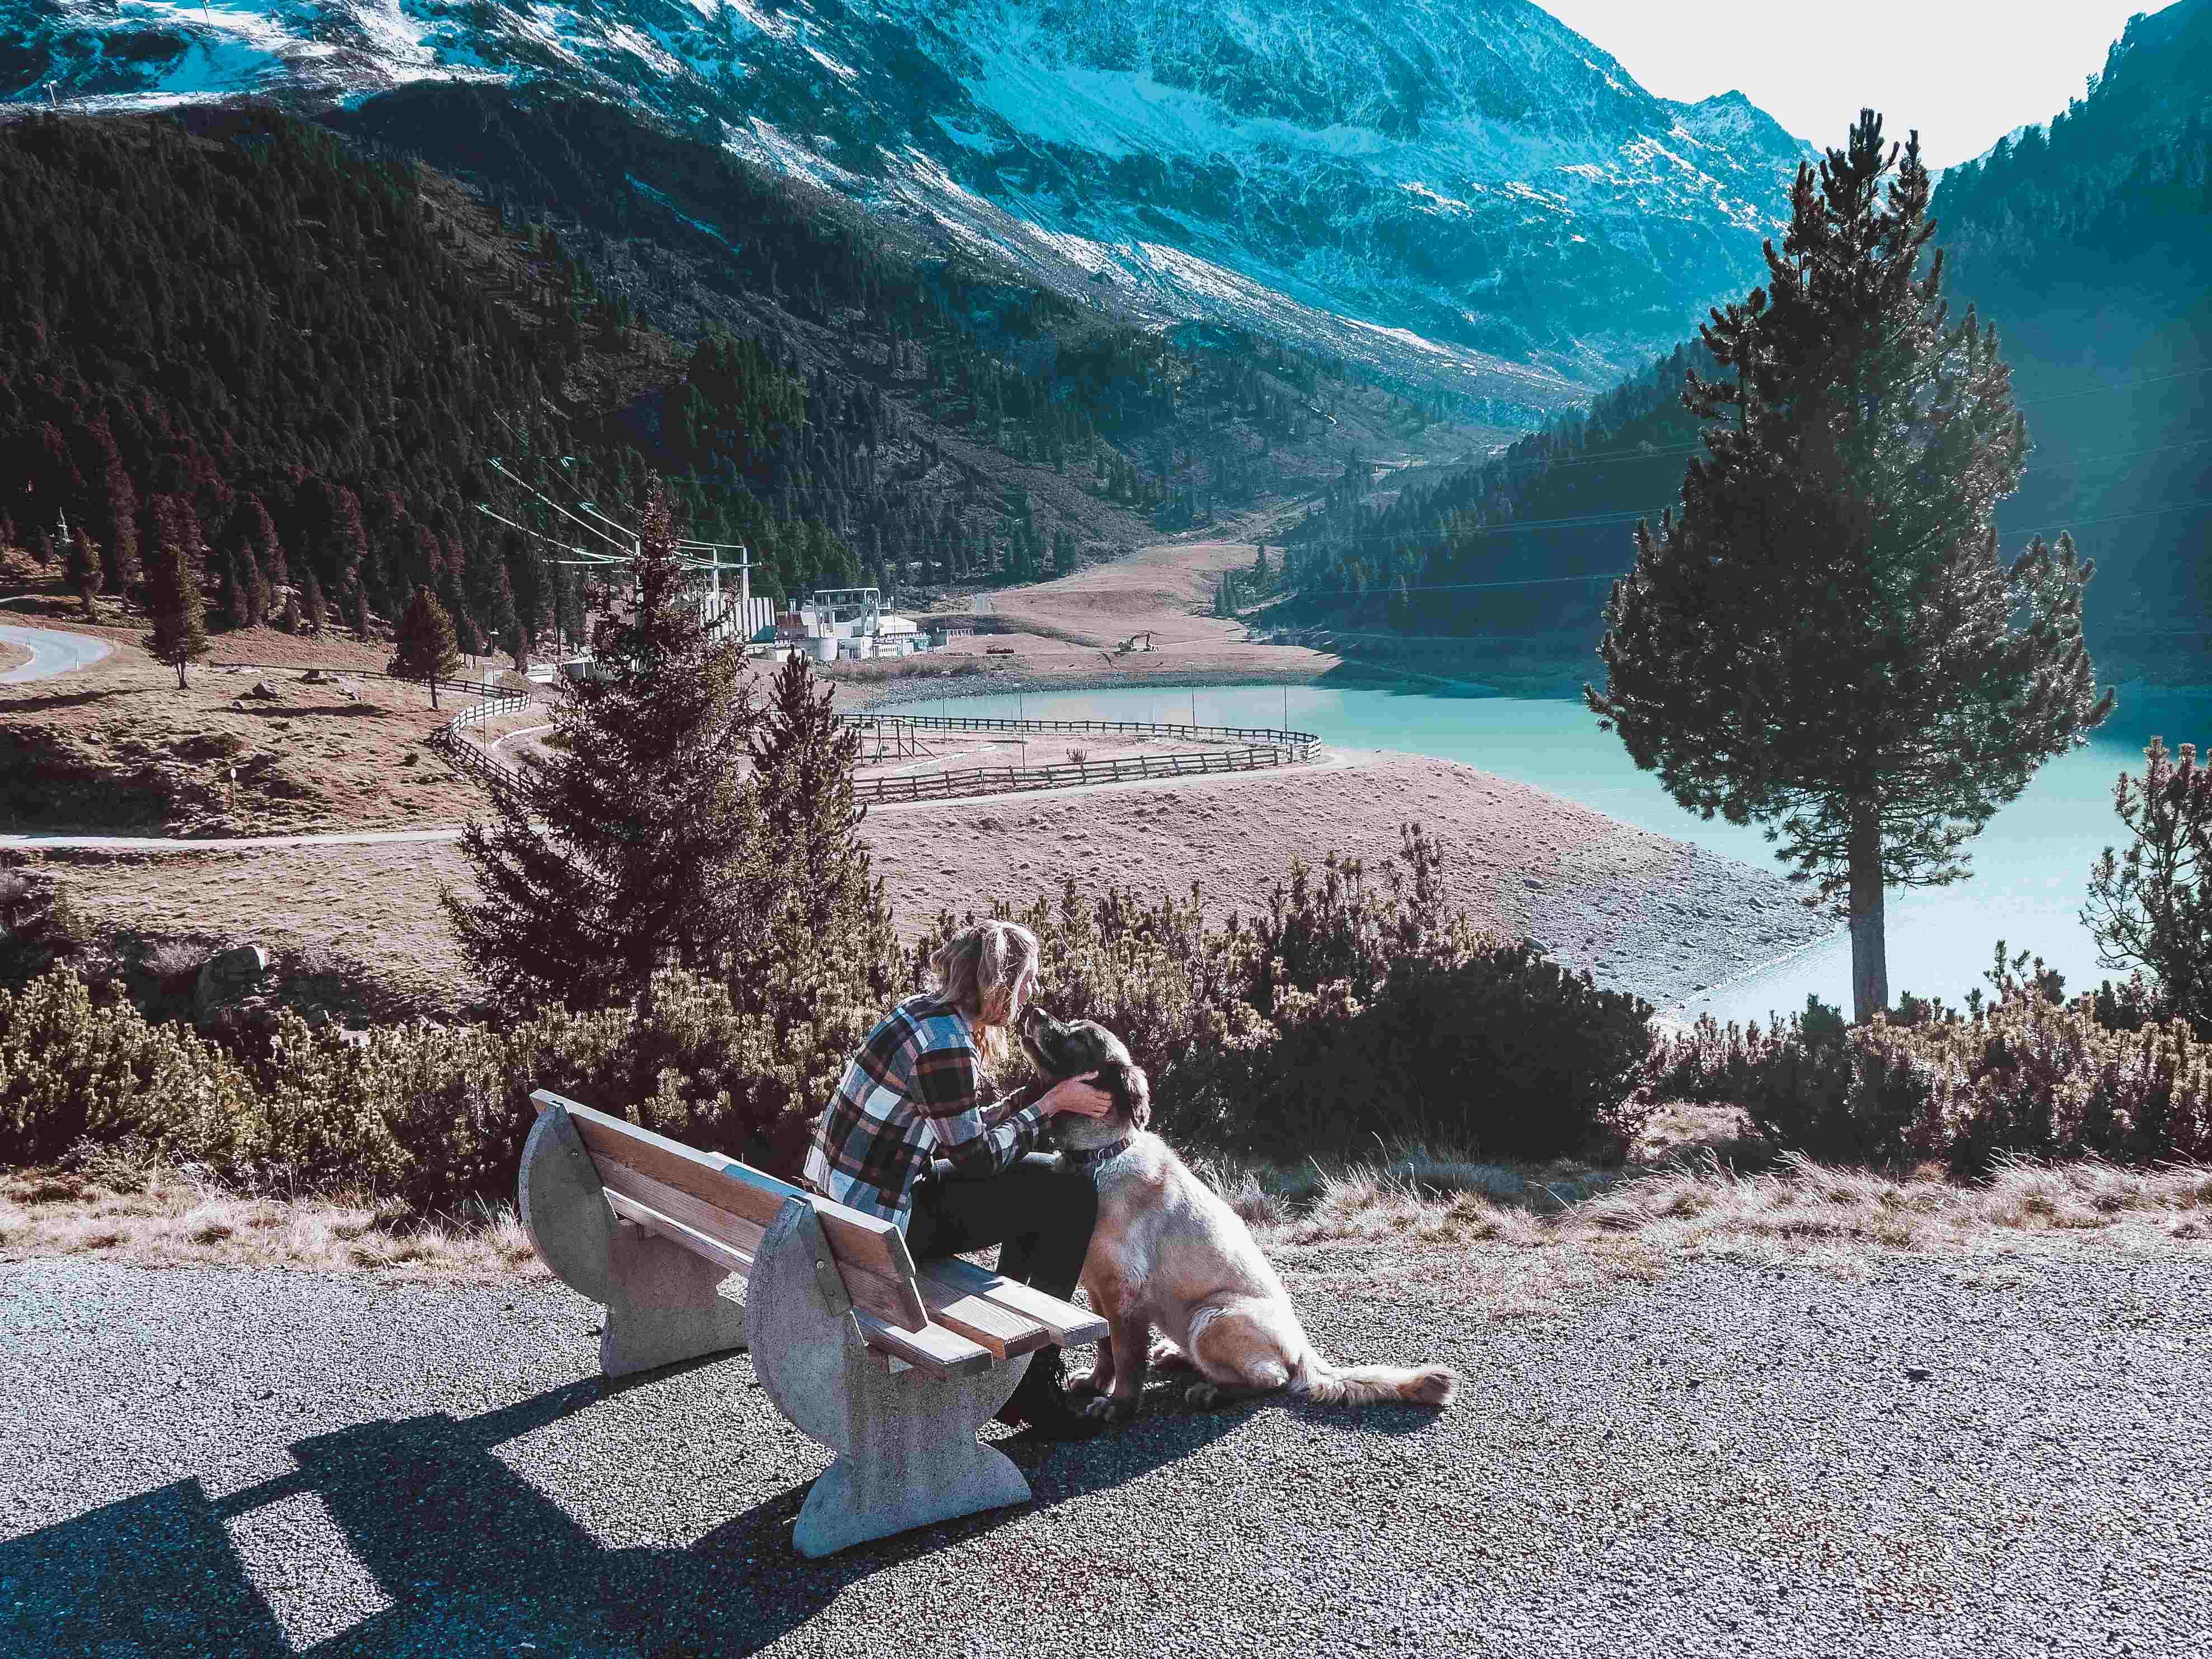 travelblogger celine see wanderlust 2